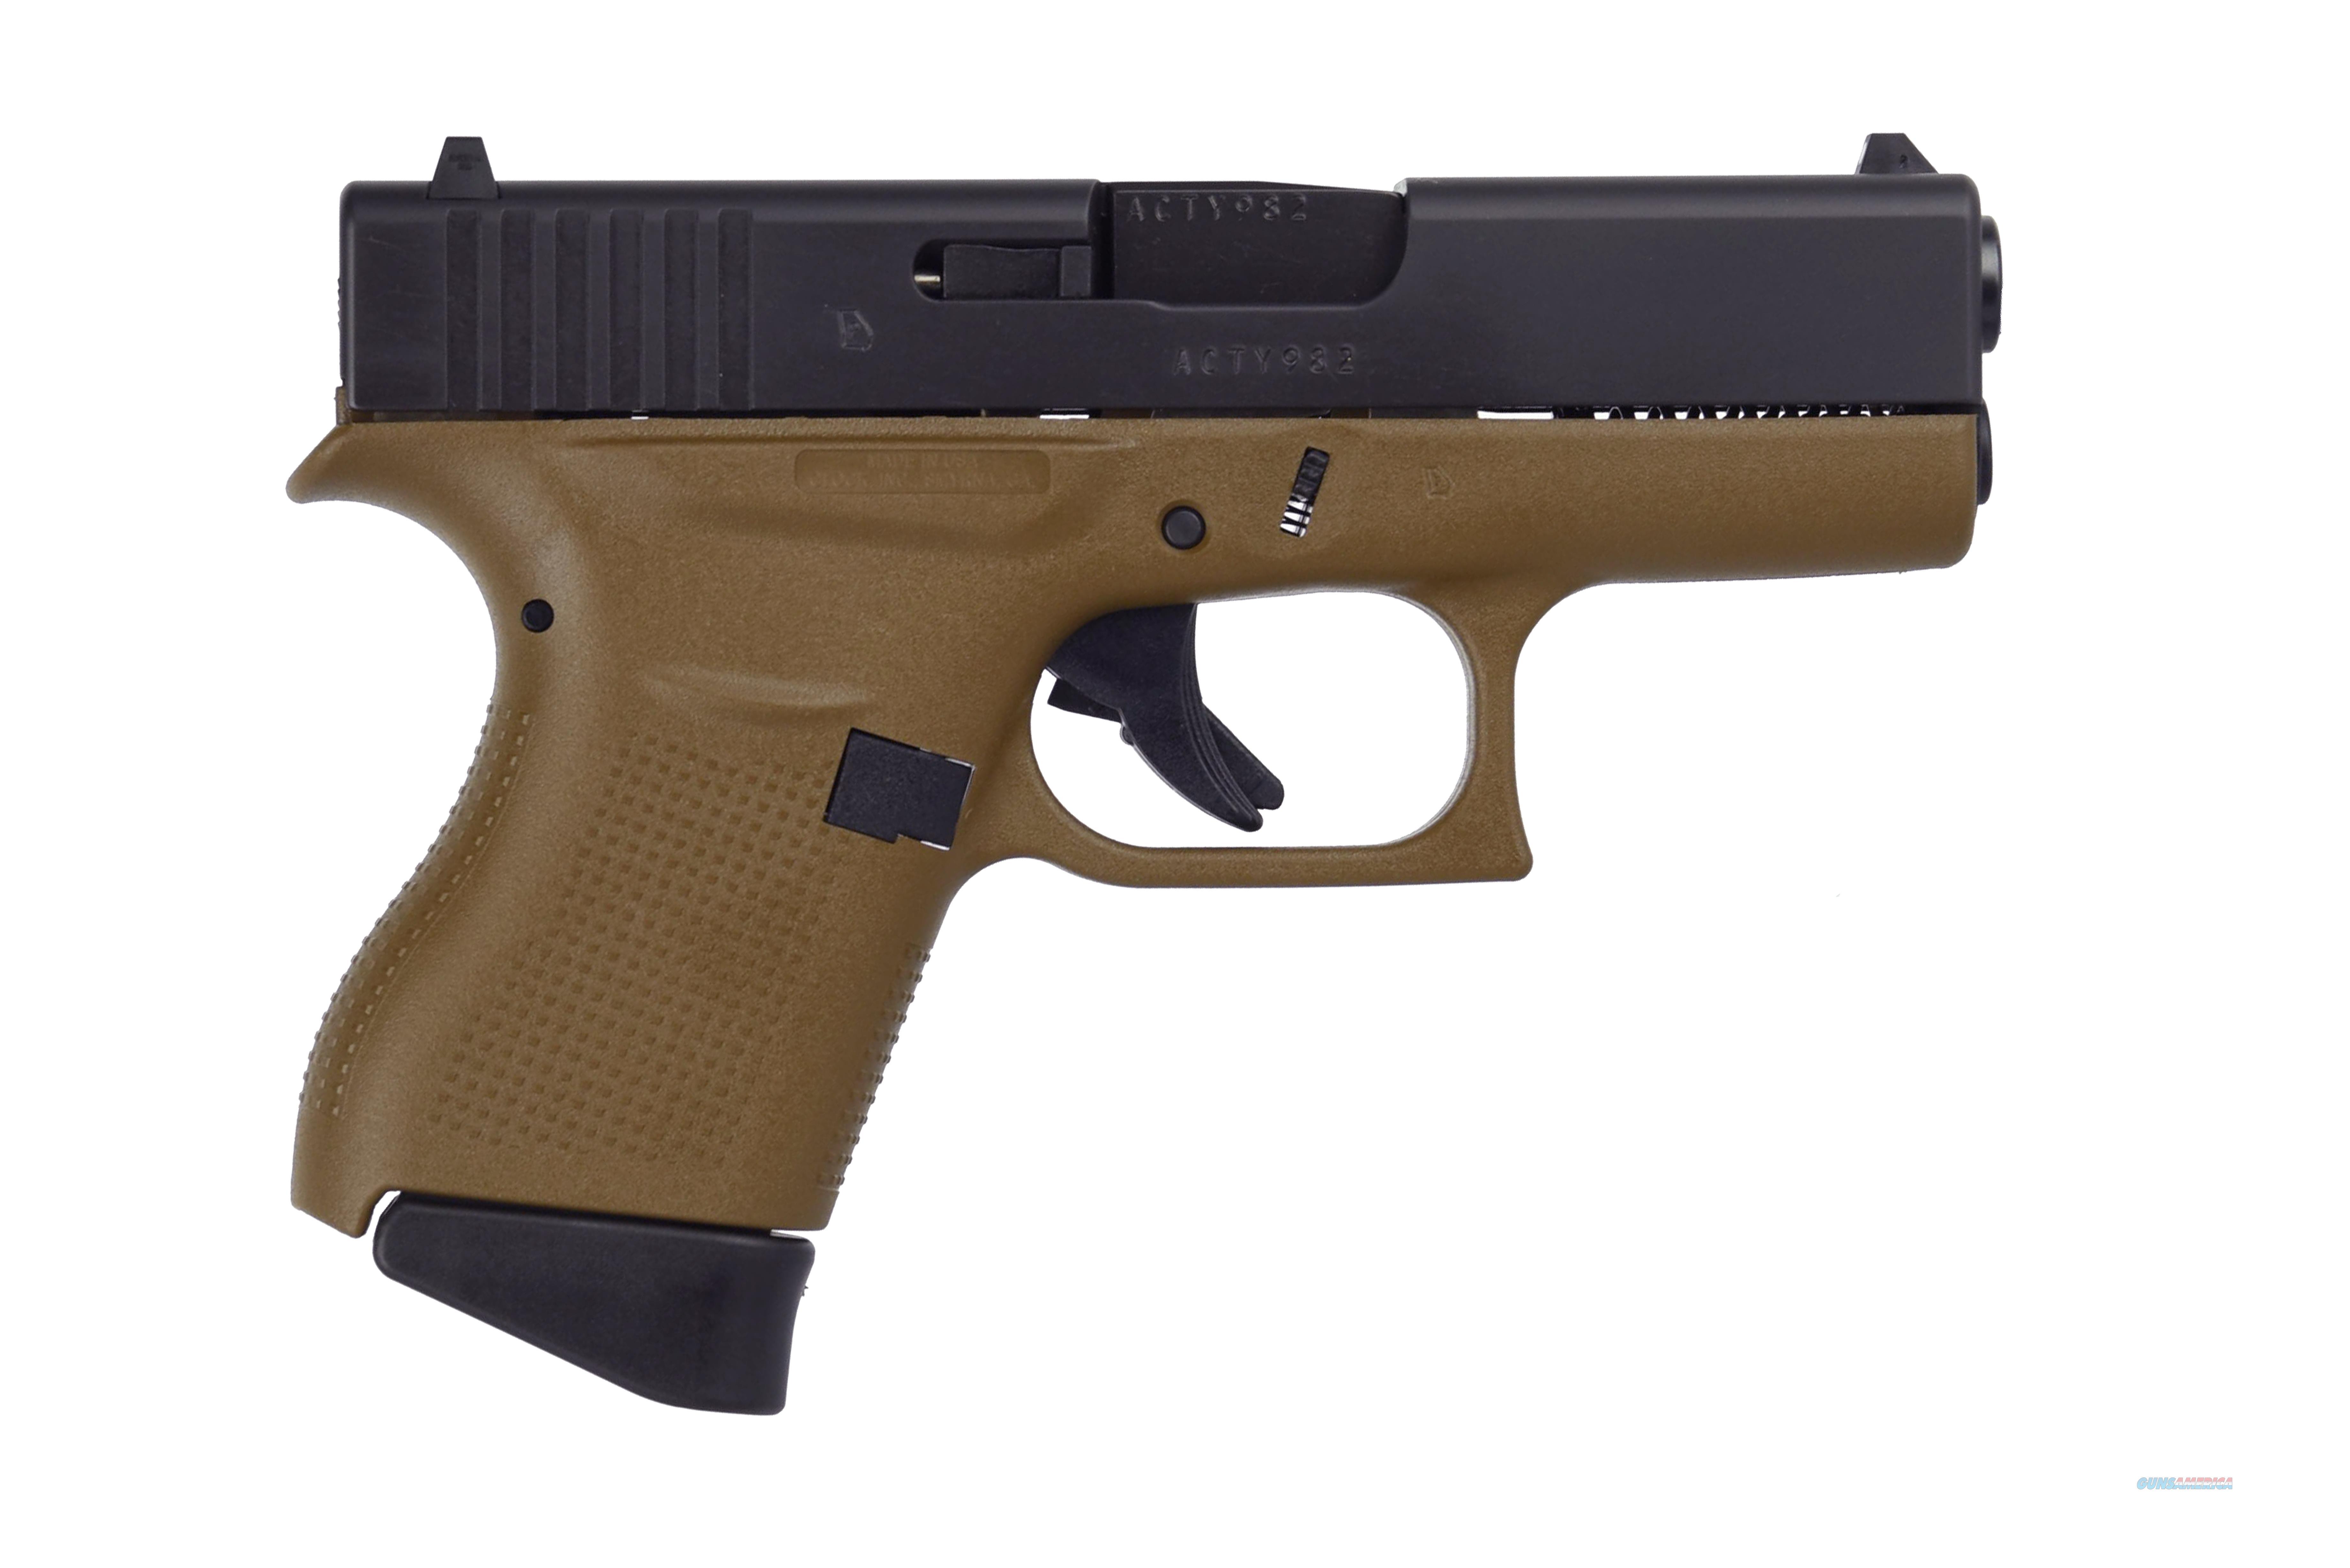 GLOCK G43 G3 FDE 9MM 6+1 3.39 FS TWO 6RD MAGAZINES  Guns > Pistols > Glock Pistols > 43